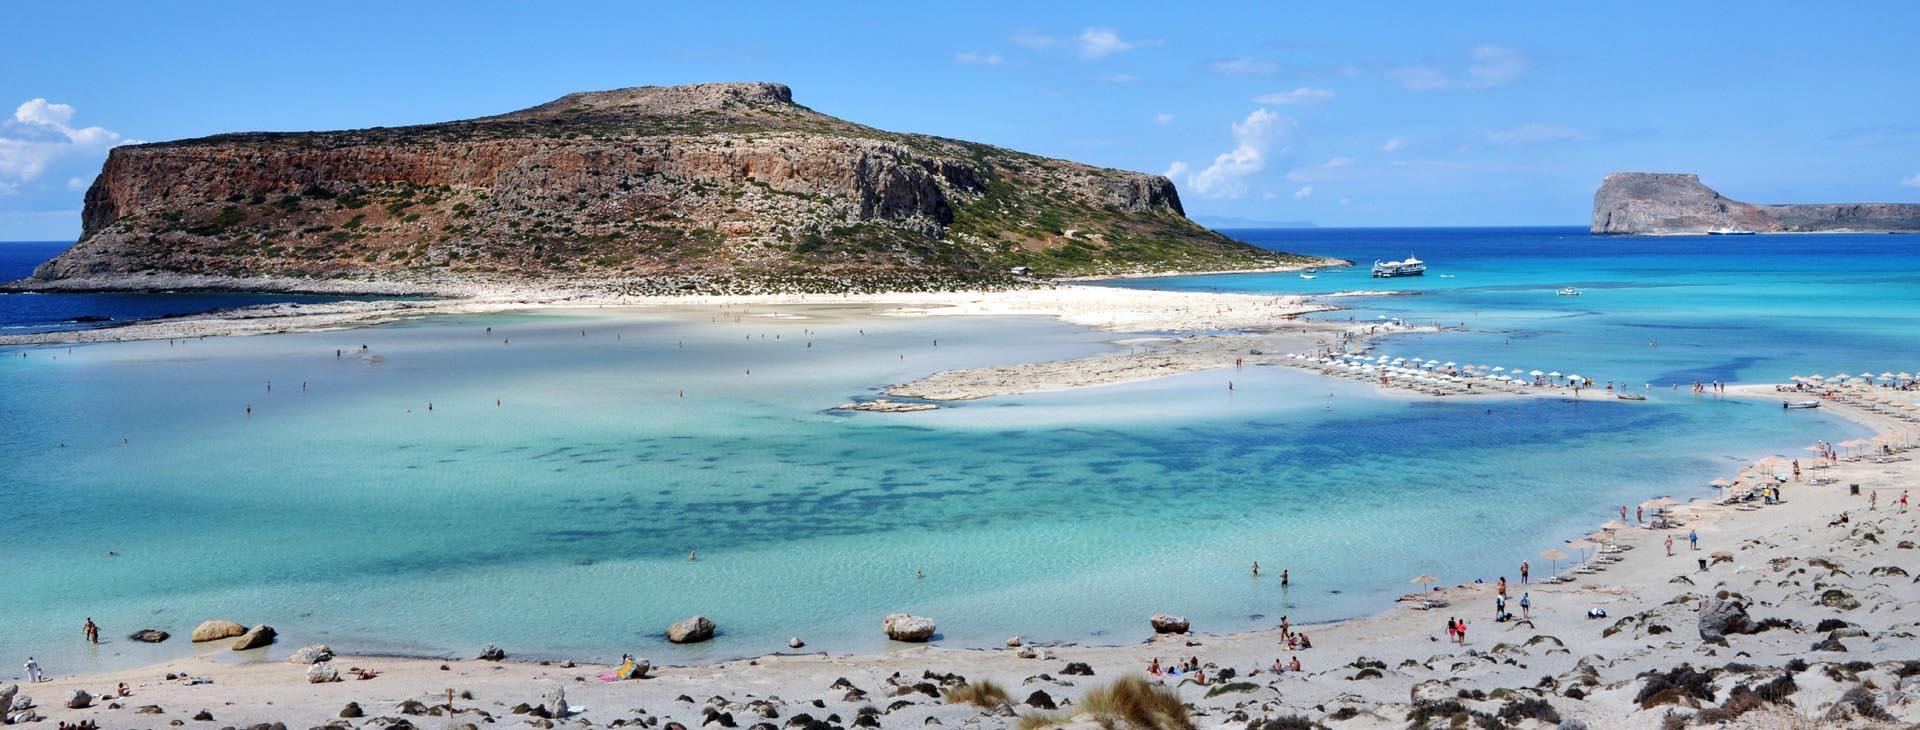 Bralos beach, Chania